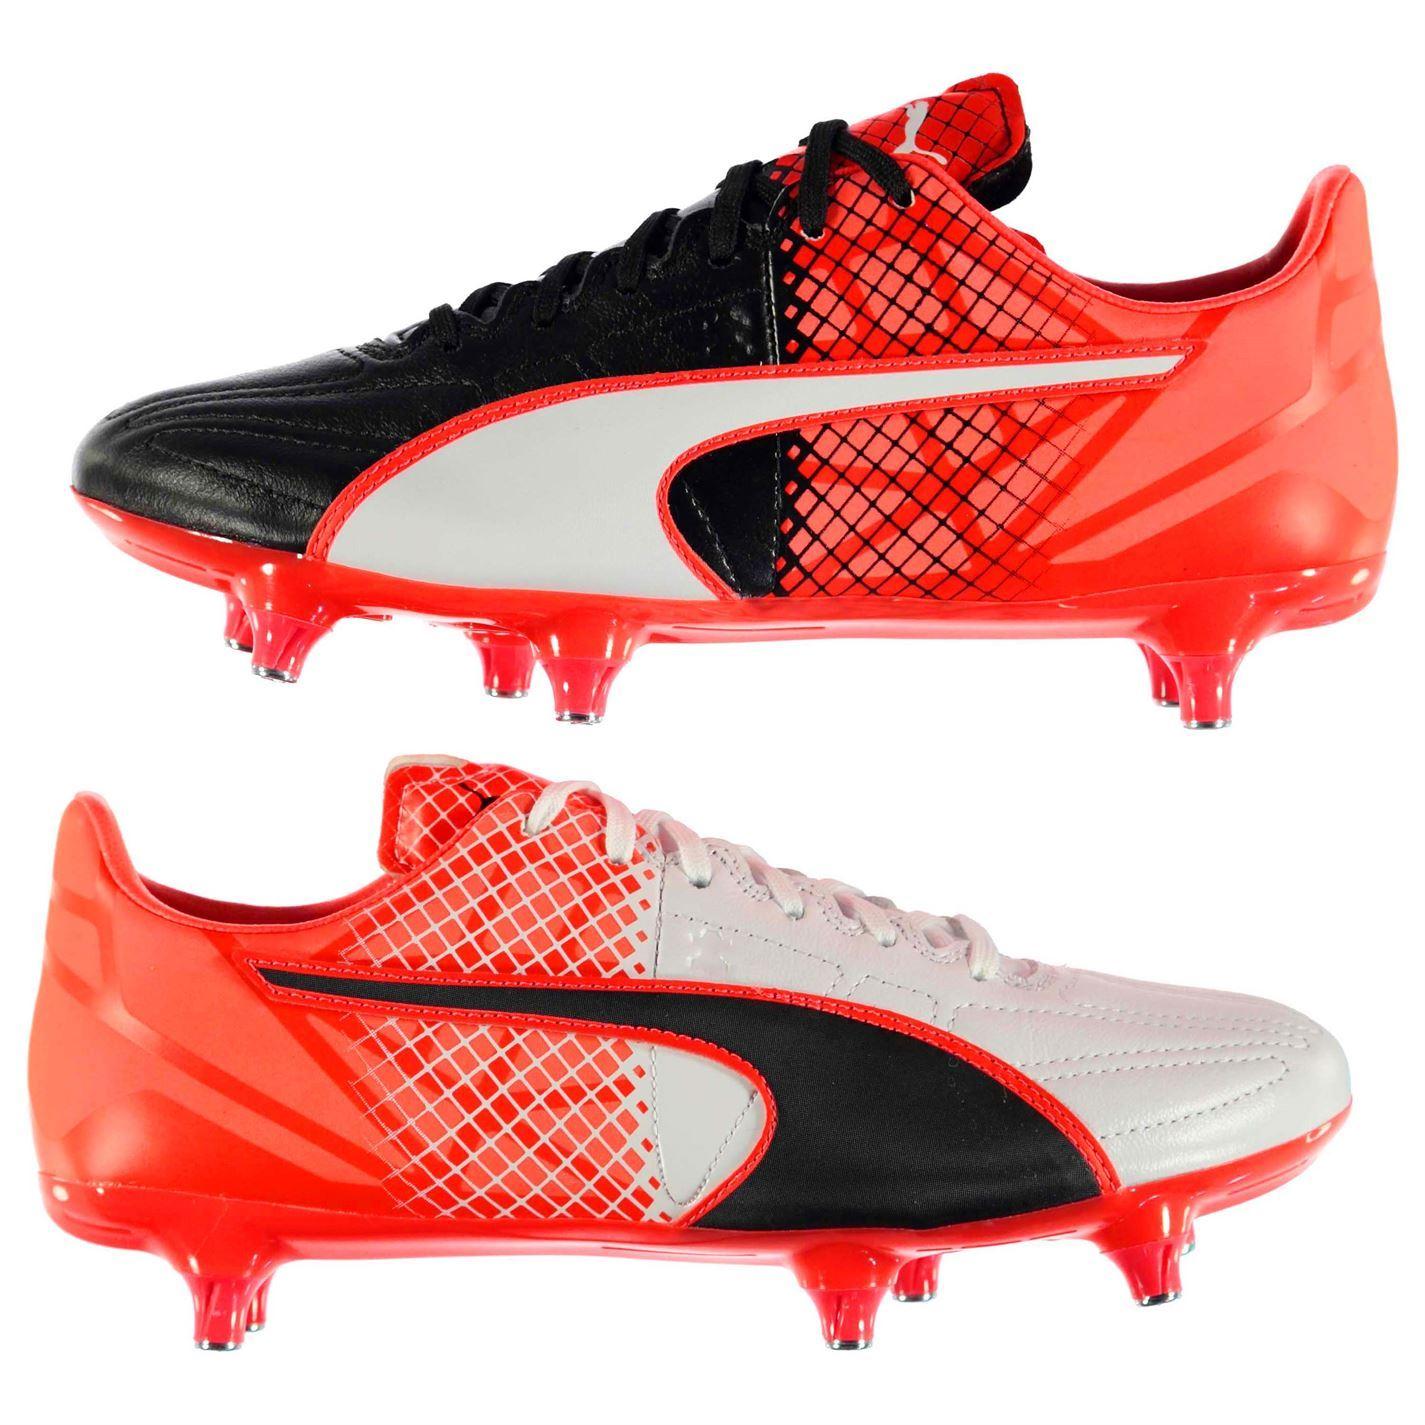 ... Puma evoSpeed 3.5 Leather SG Soft Ground Football Boots Mens Blk Rd Soccer  Shoes ... 19487f0b4